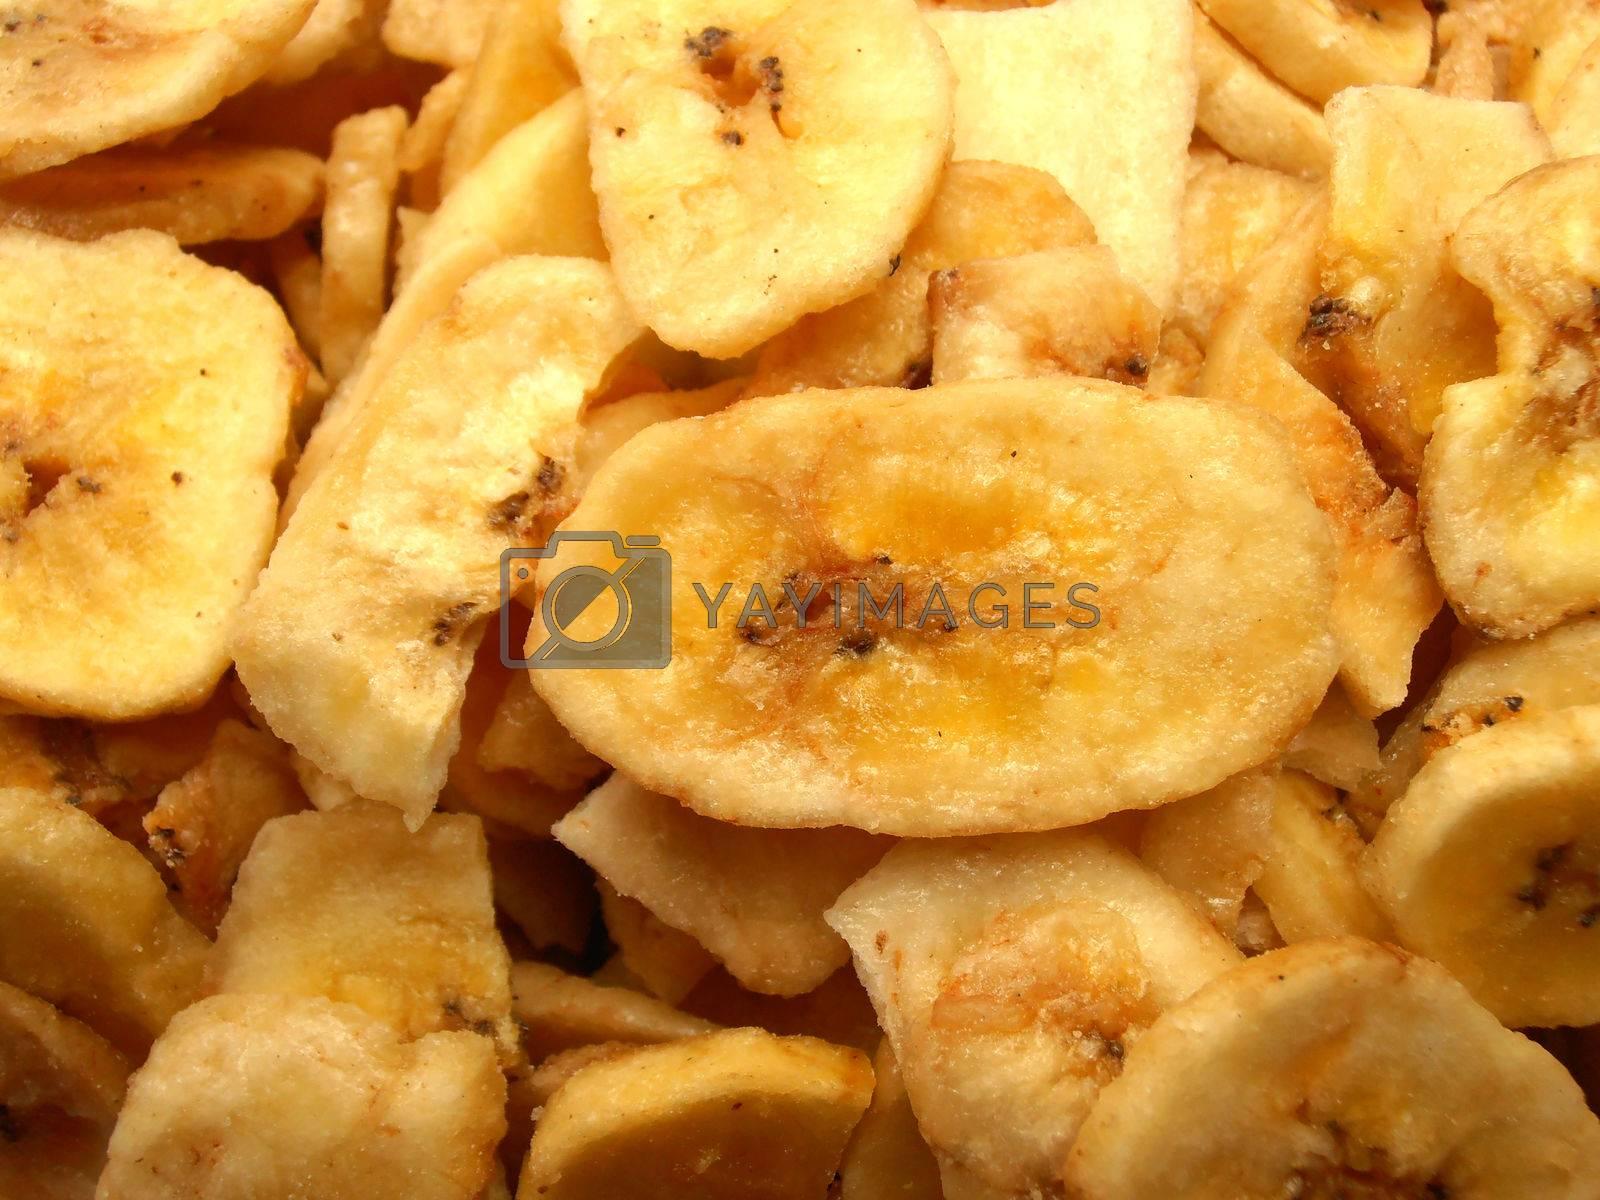 Dried bananas by Helena16